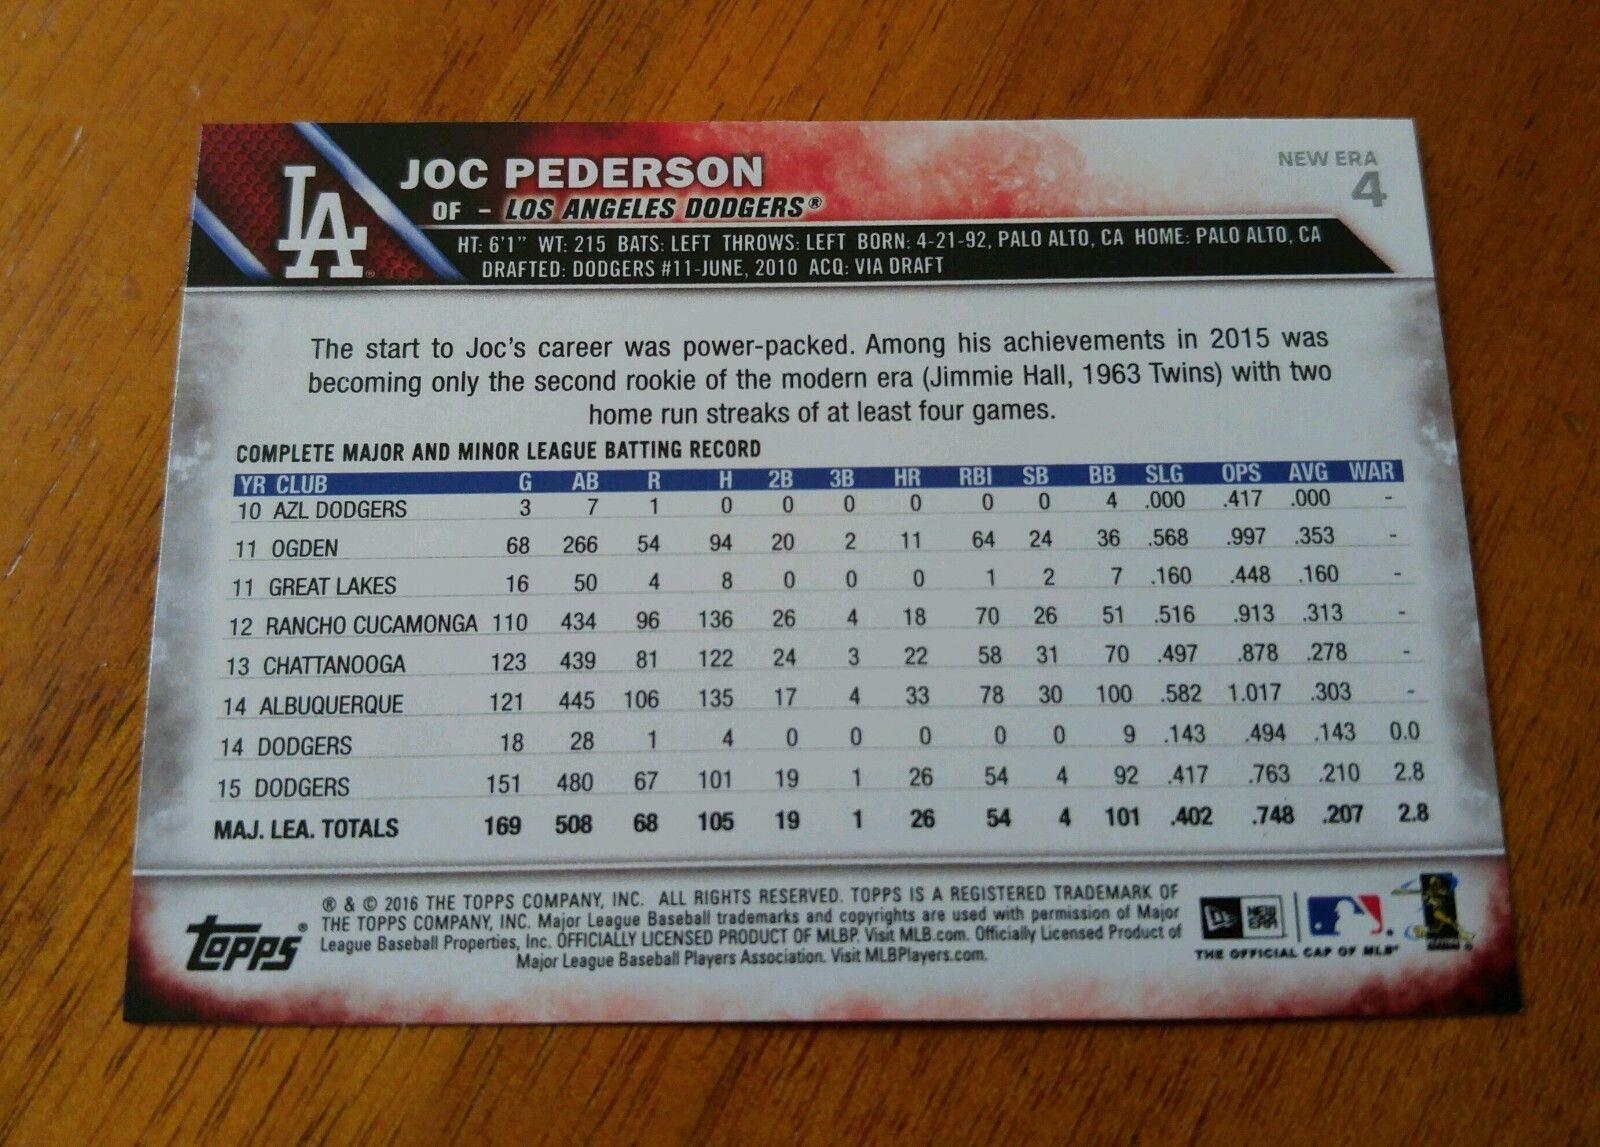 0a34501cf65 Dodgers Blue Heaven  2016 Topps New Era Cap Baseball Cards at LIDS ...